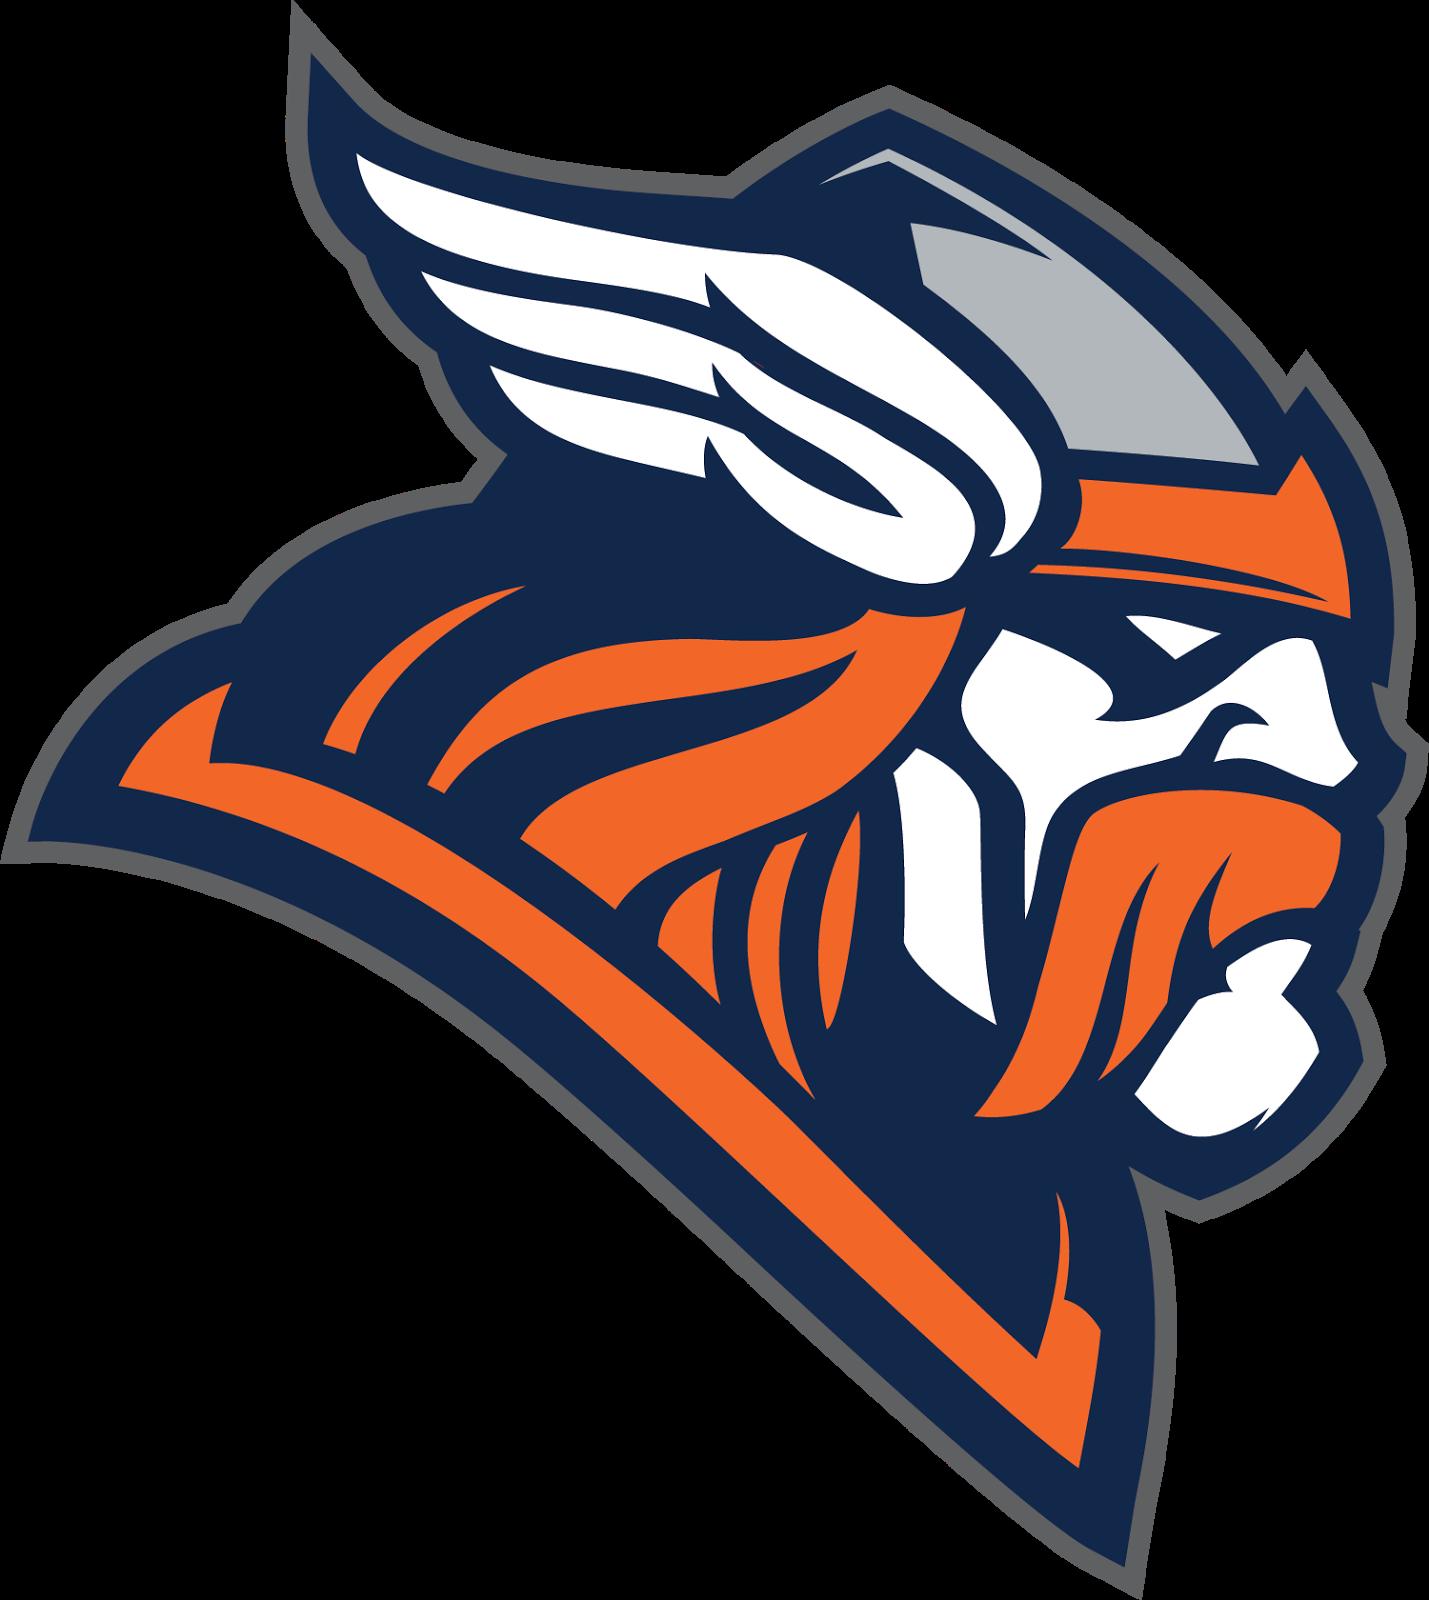 Pin By Joey Cales On Logos Fantasy Football Logos Sports Logo Inspiration Viking Logo